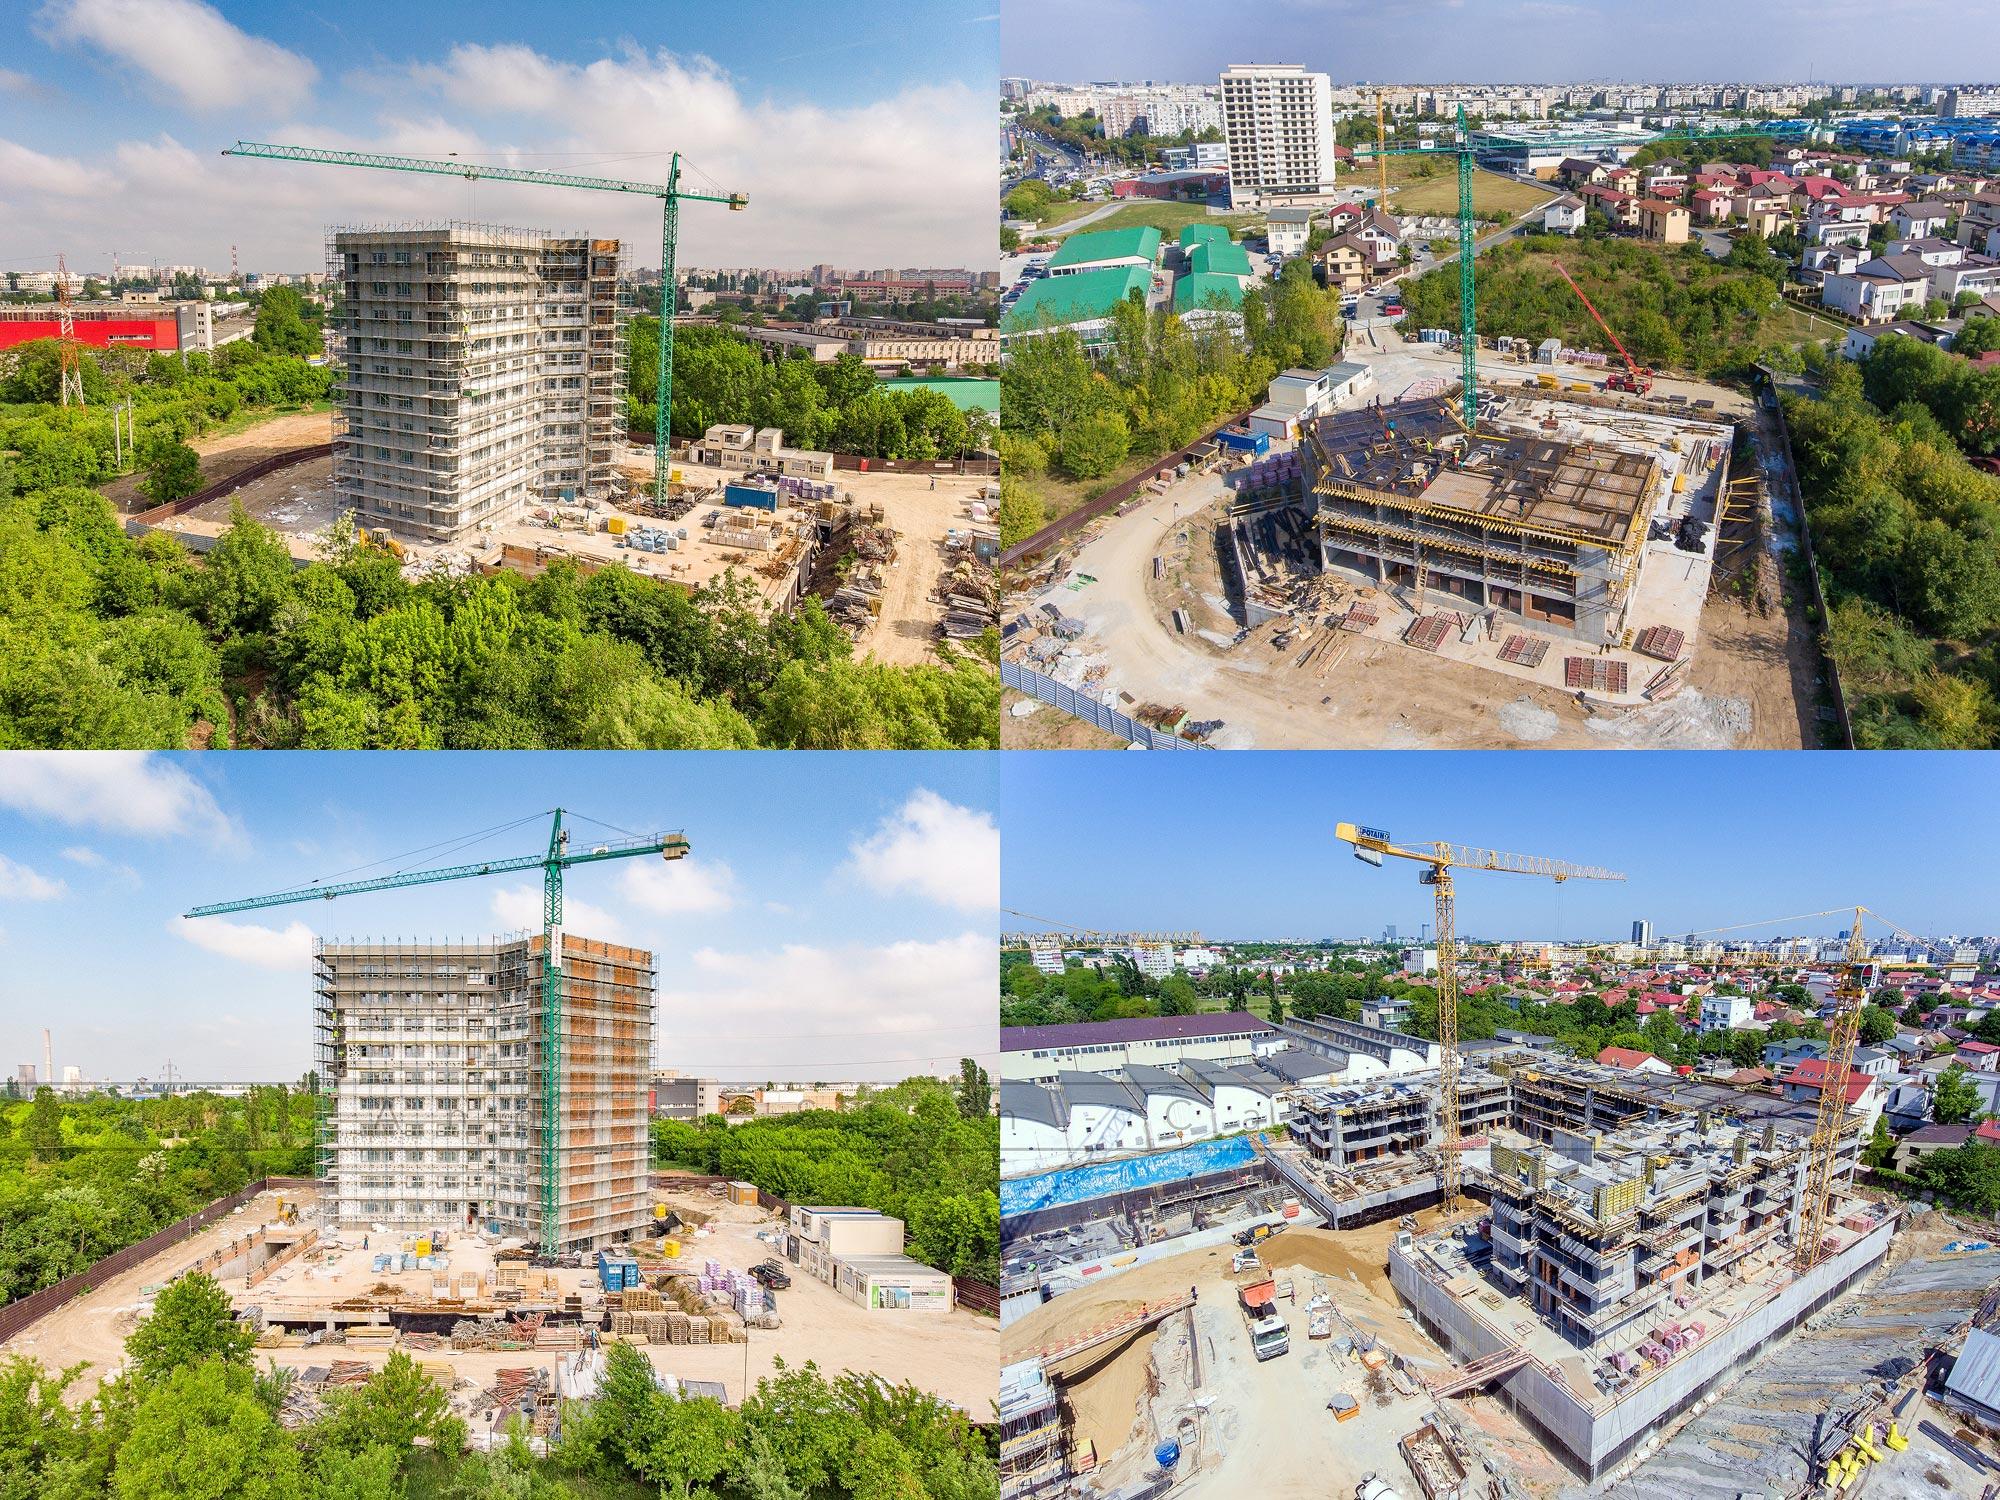 Fotografii profesionale pentru ansambluri imobiliare si dezvoltatori